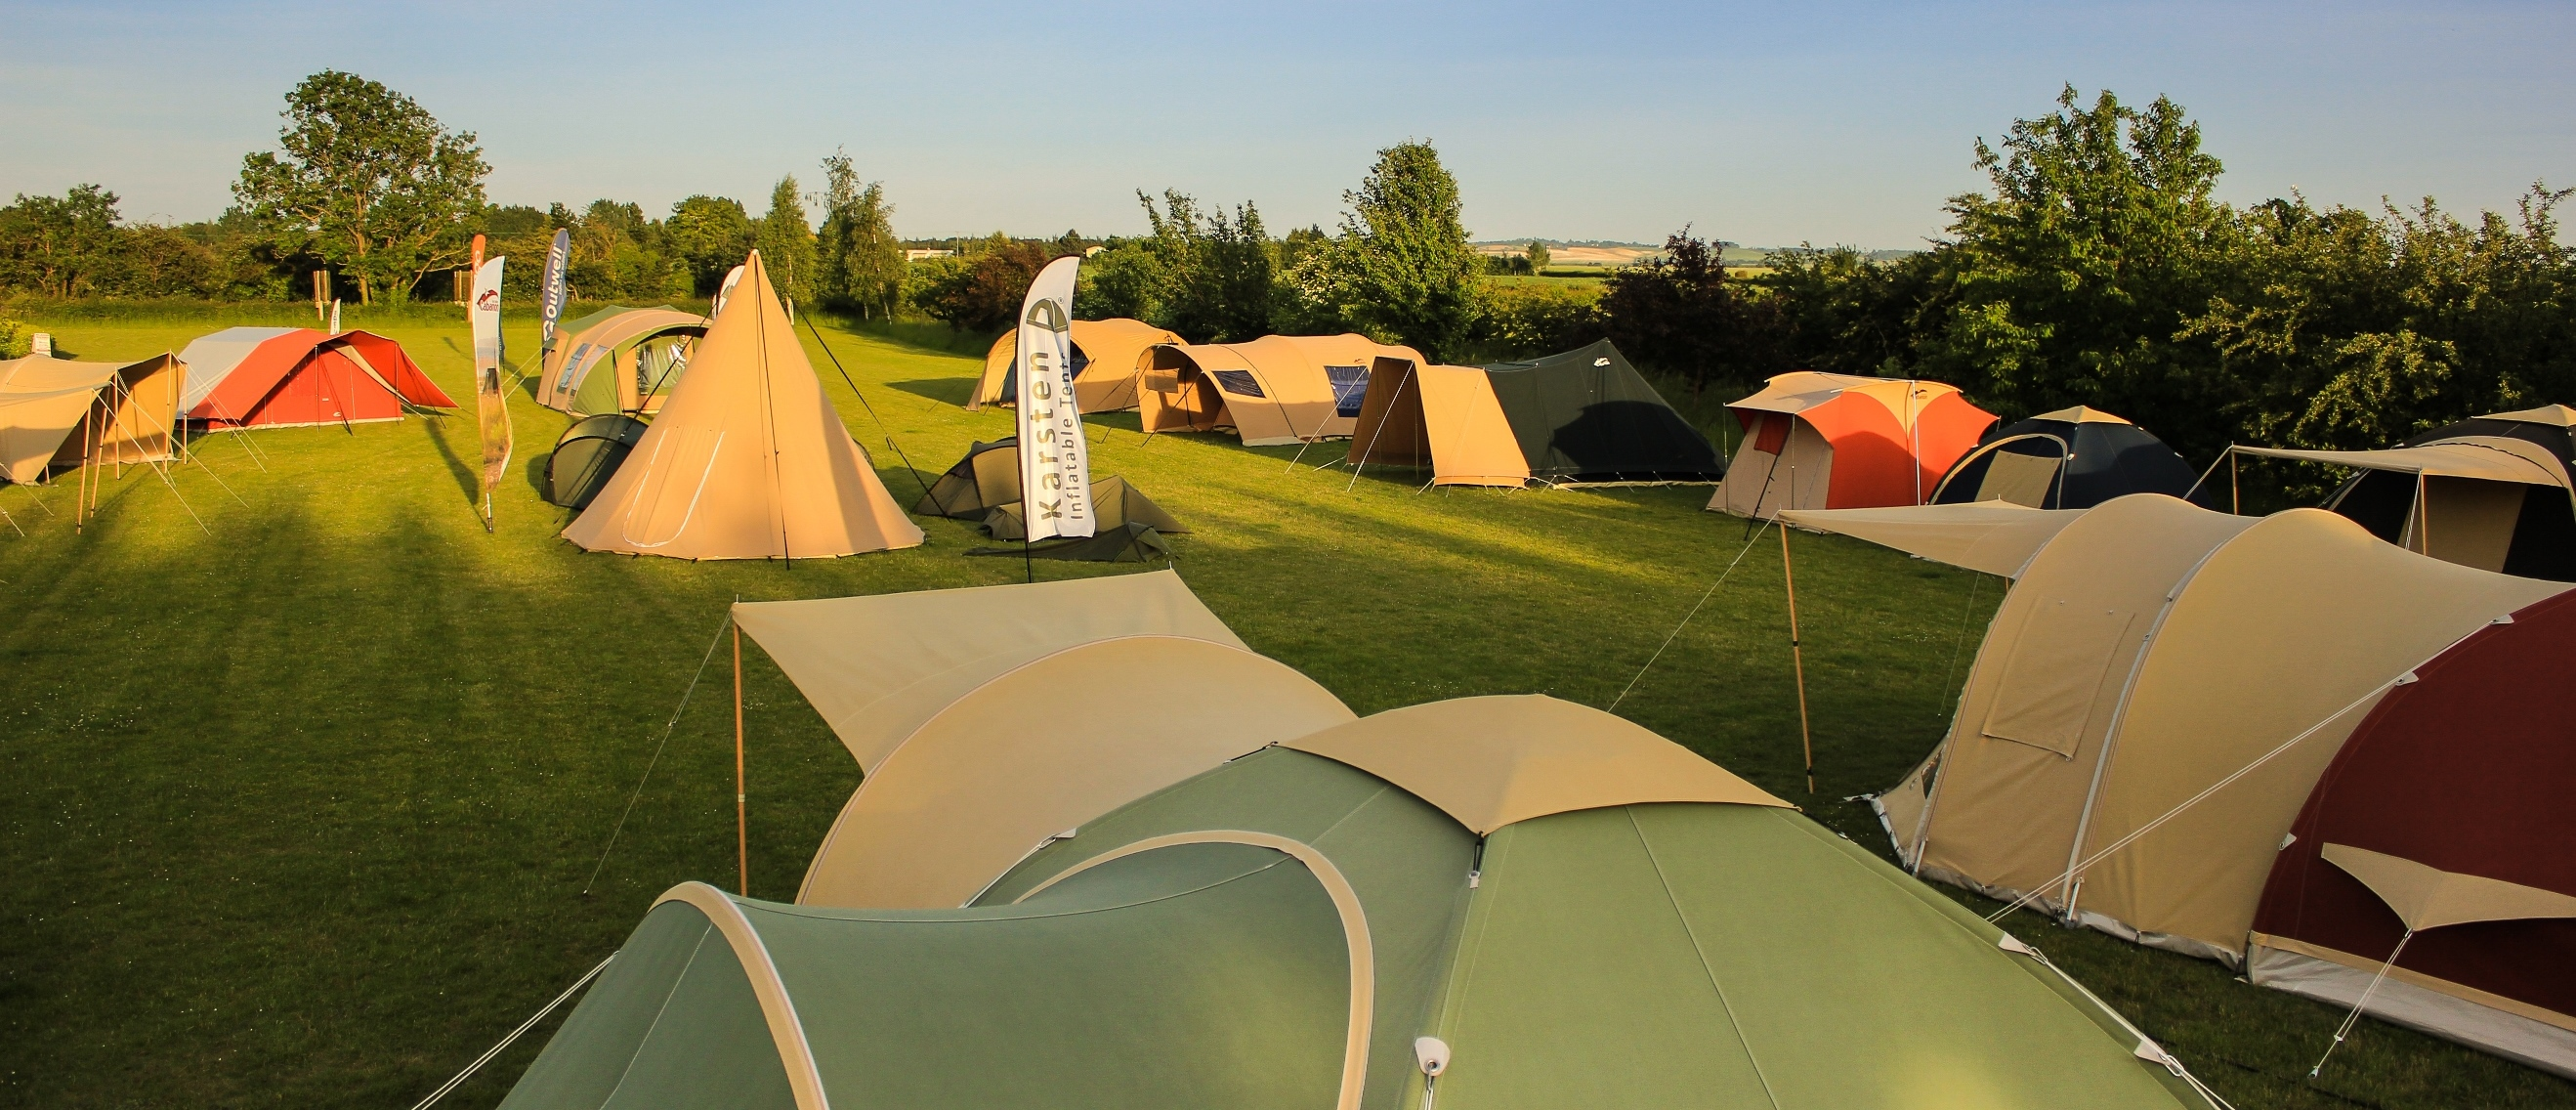 Camping Travel Store Tent Displays